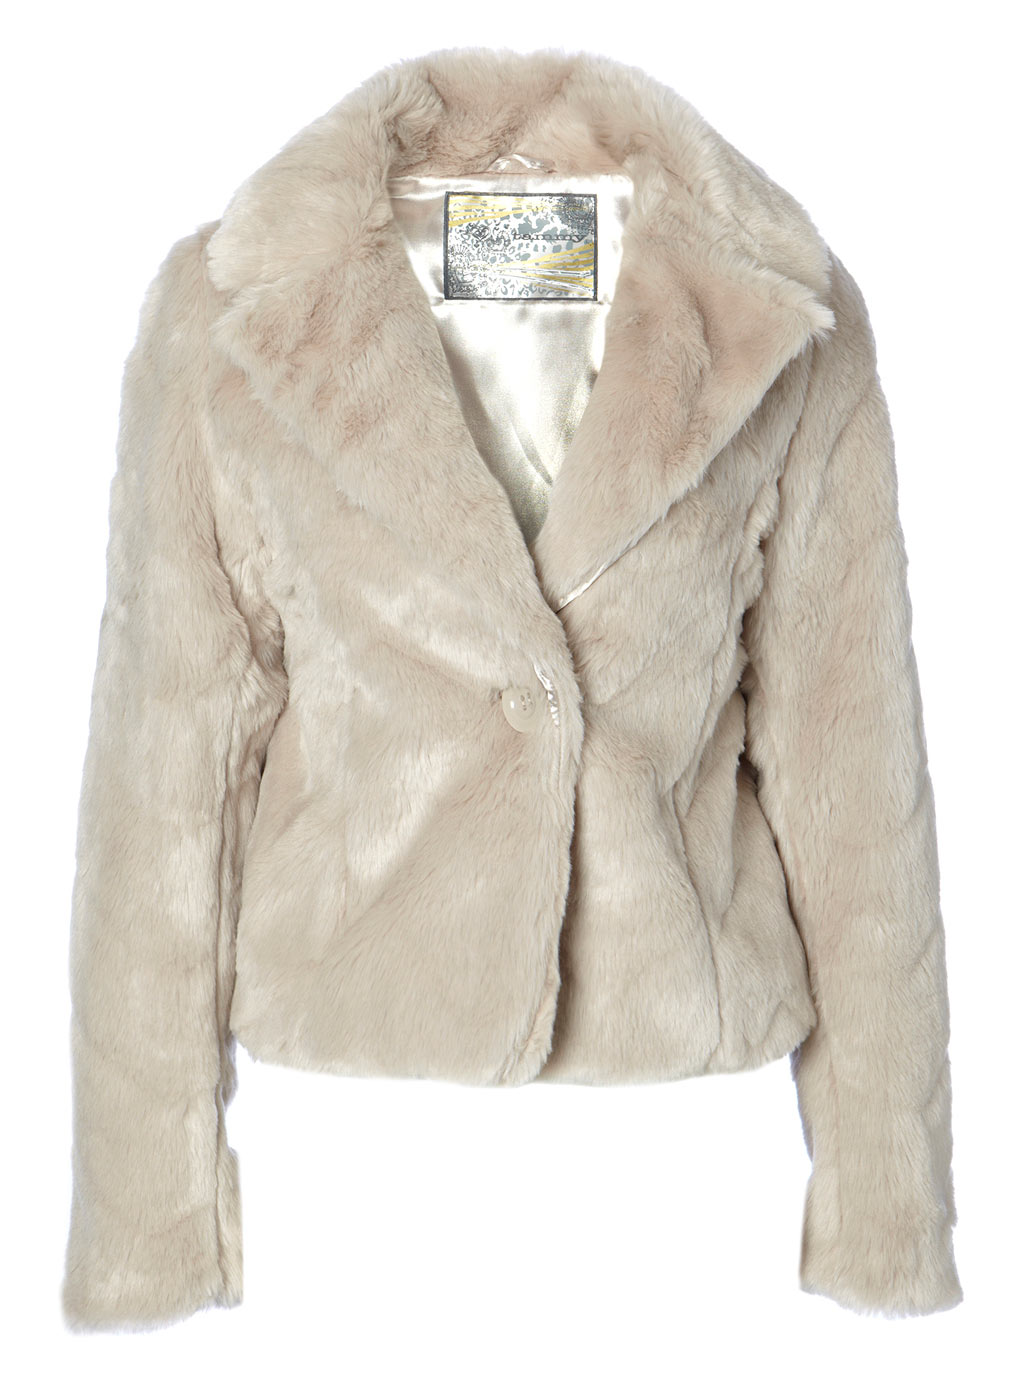 short-fur. Best 10 Ideas for Choosing Winter Gifts